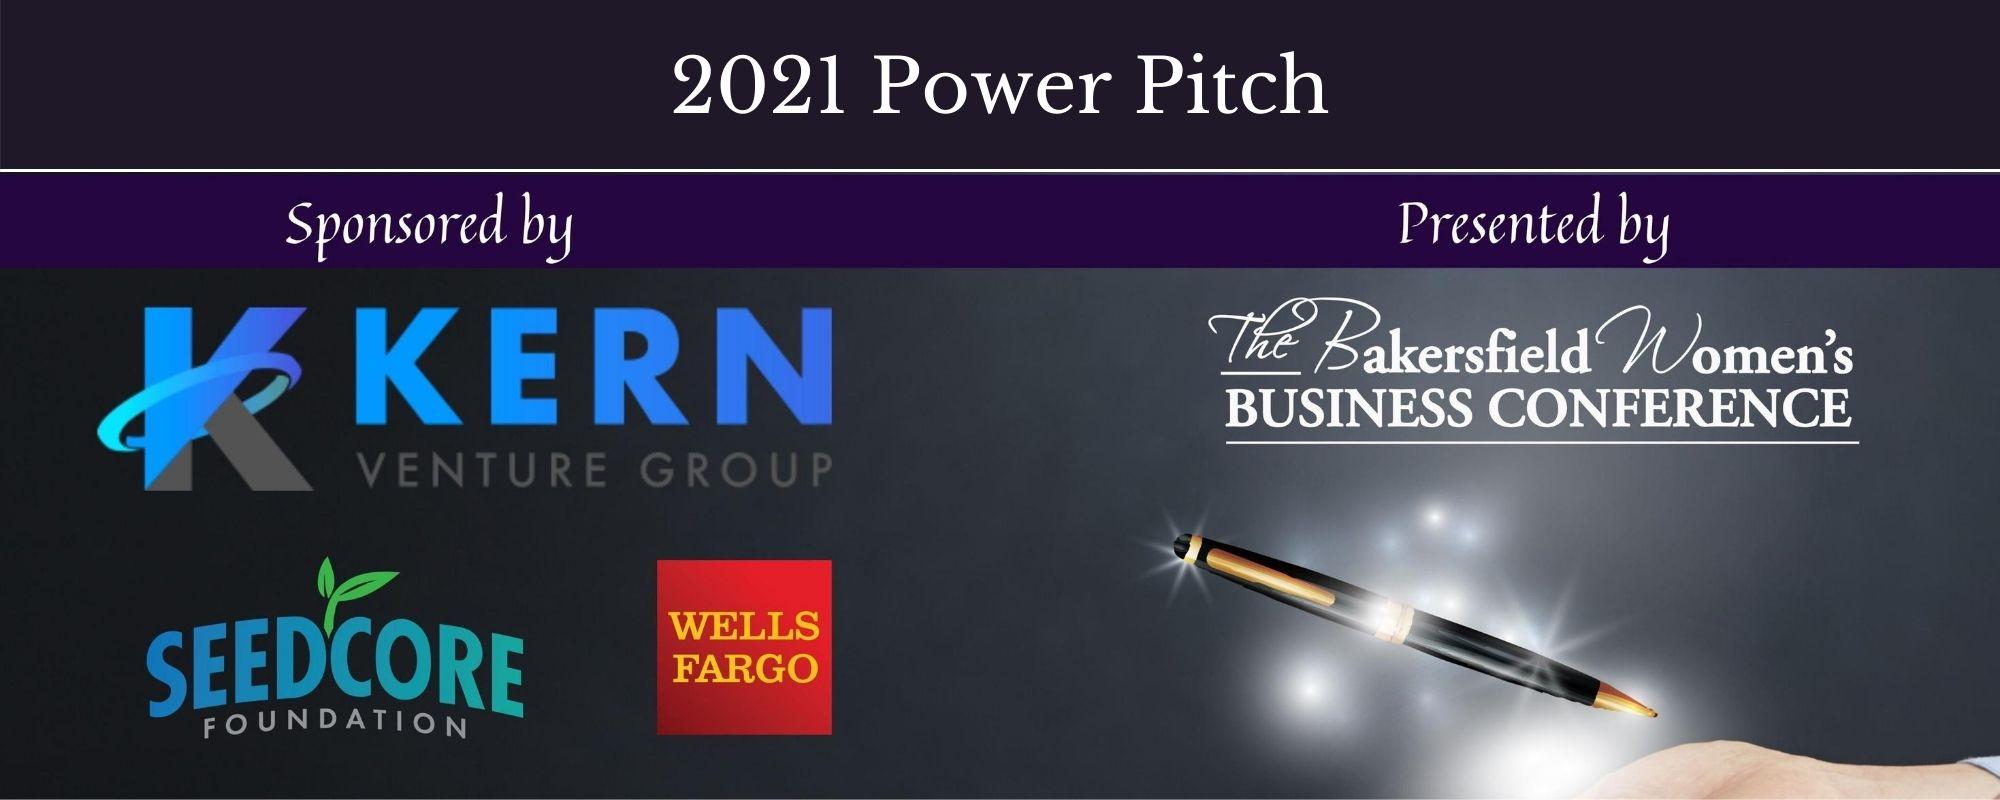 Power Pitch 2021